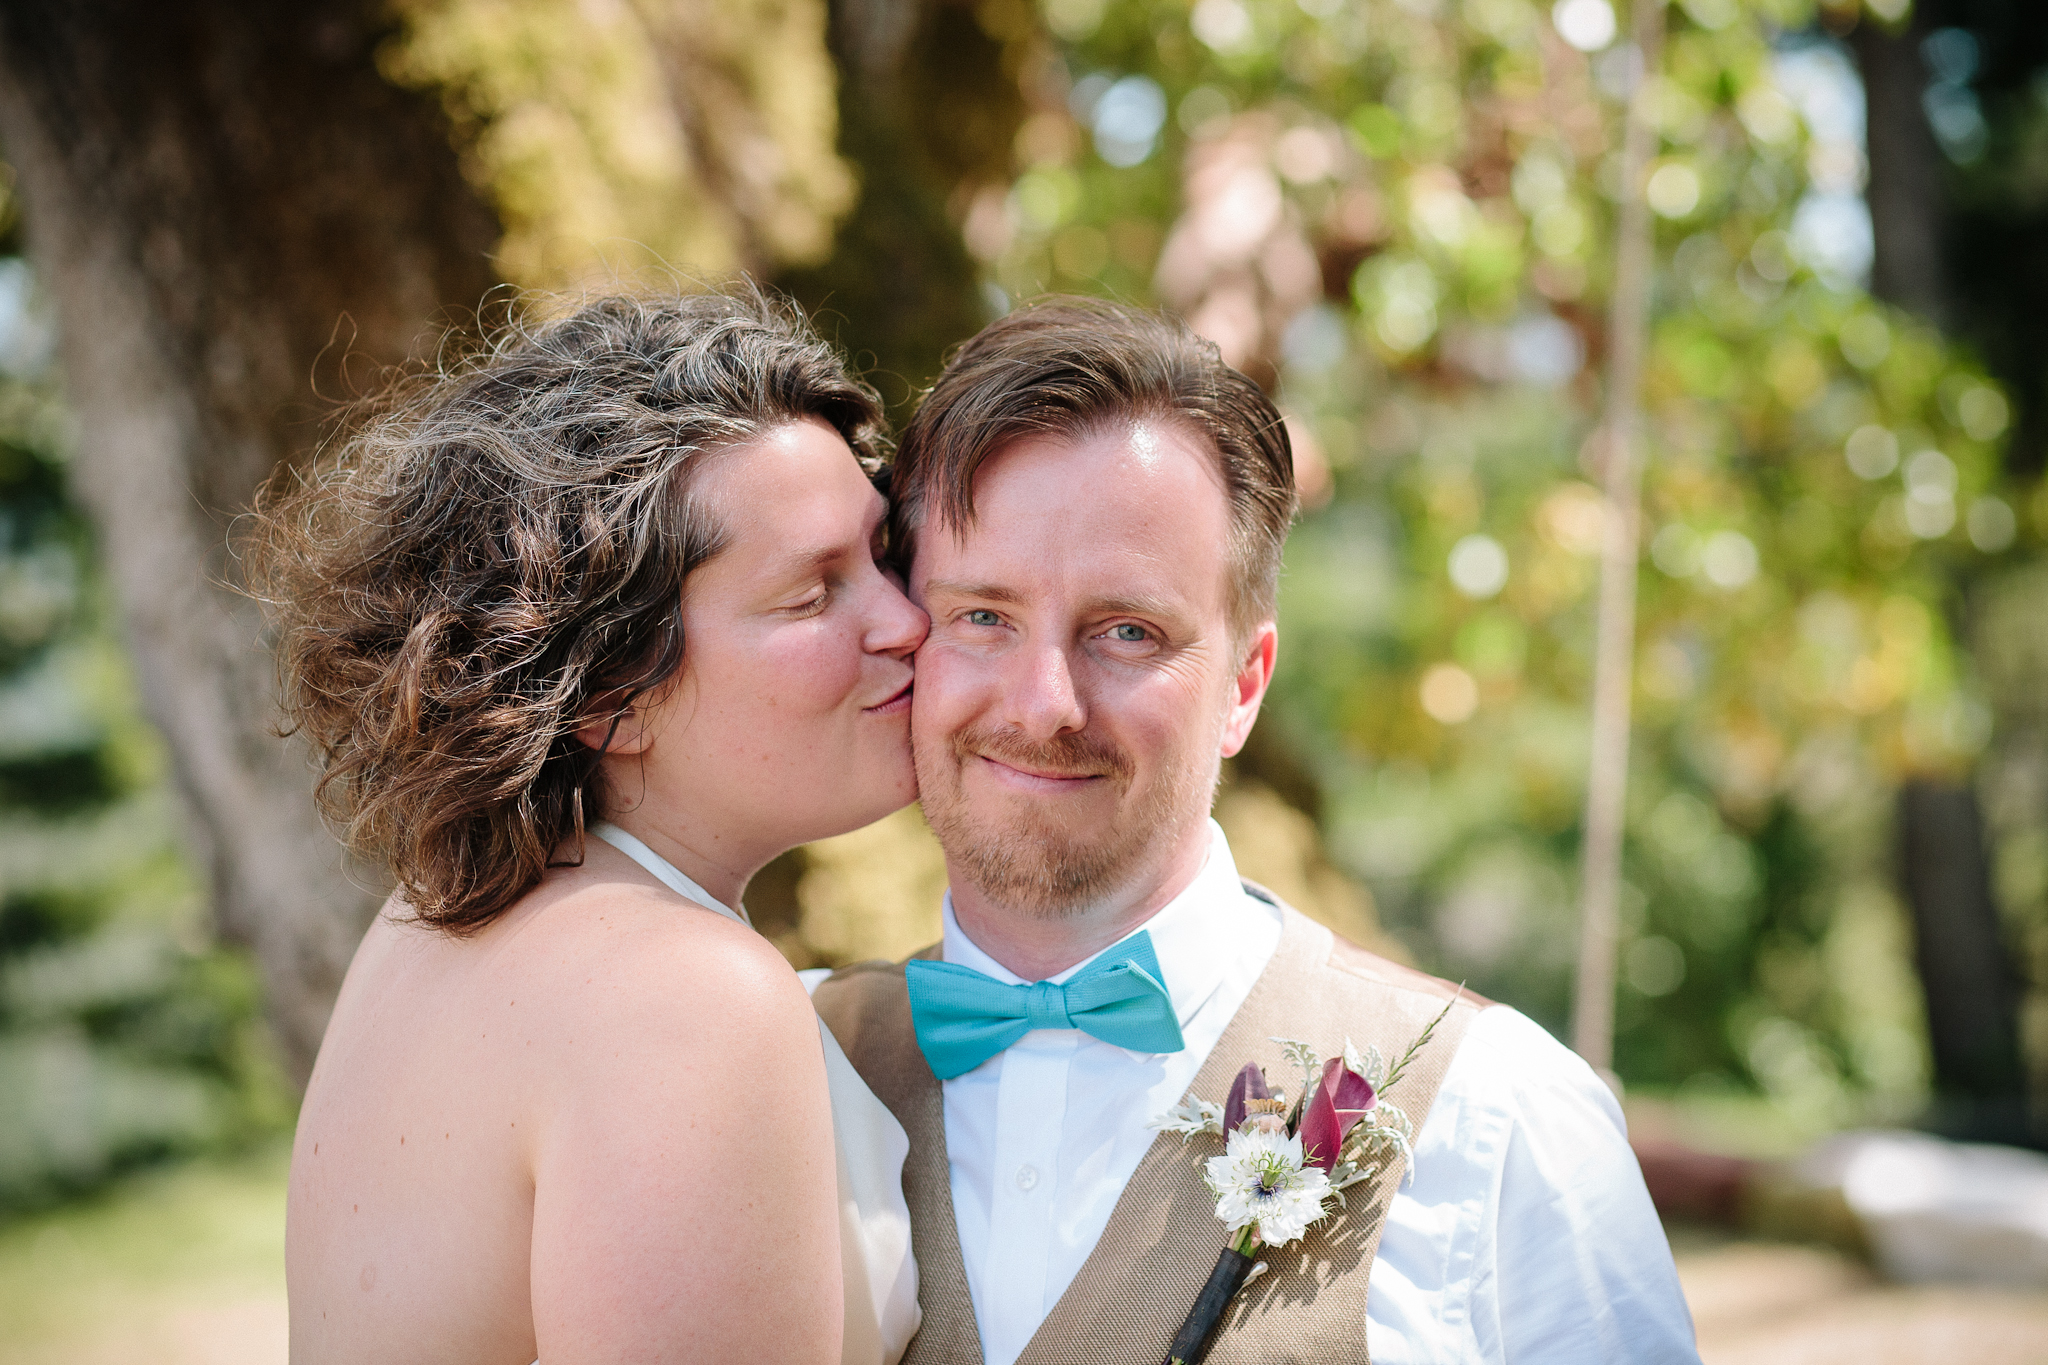 crystalchristiaan_weddingsneakpeek_2014_jenniferleahyphotography-11-of-43_14323259371_o.jpg